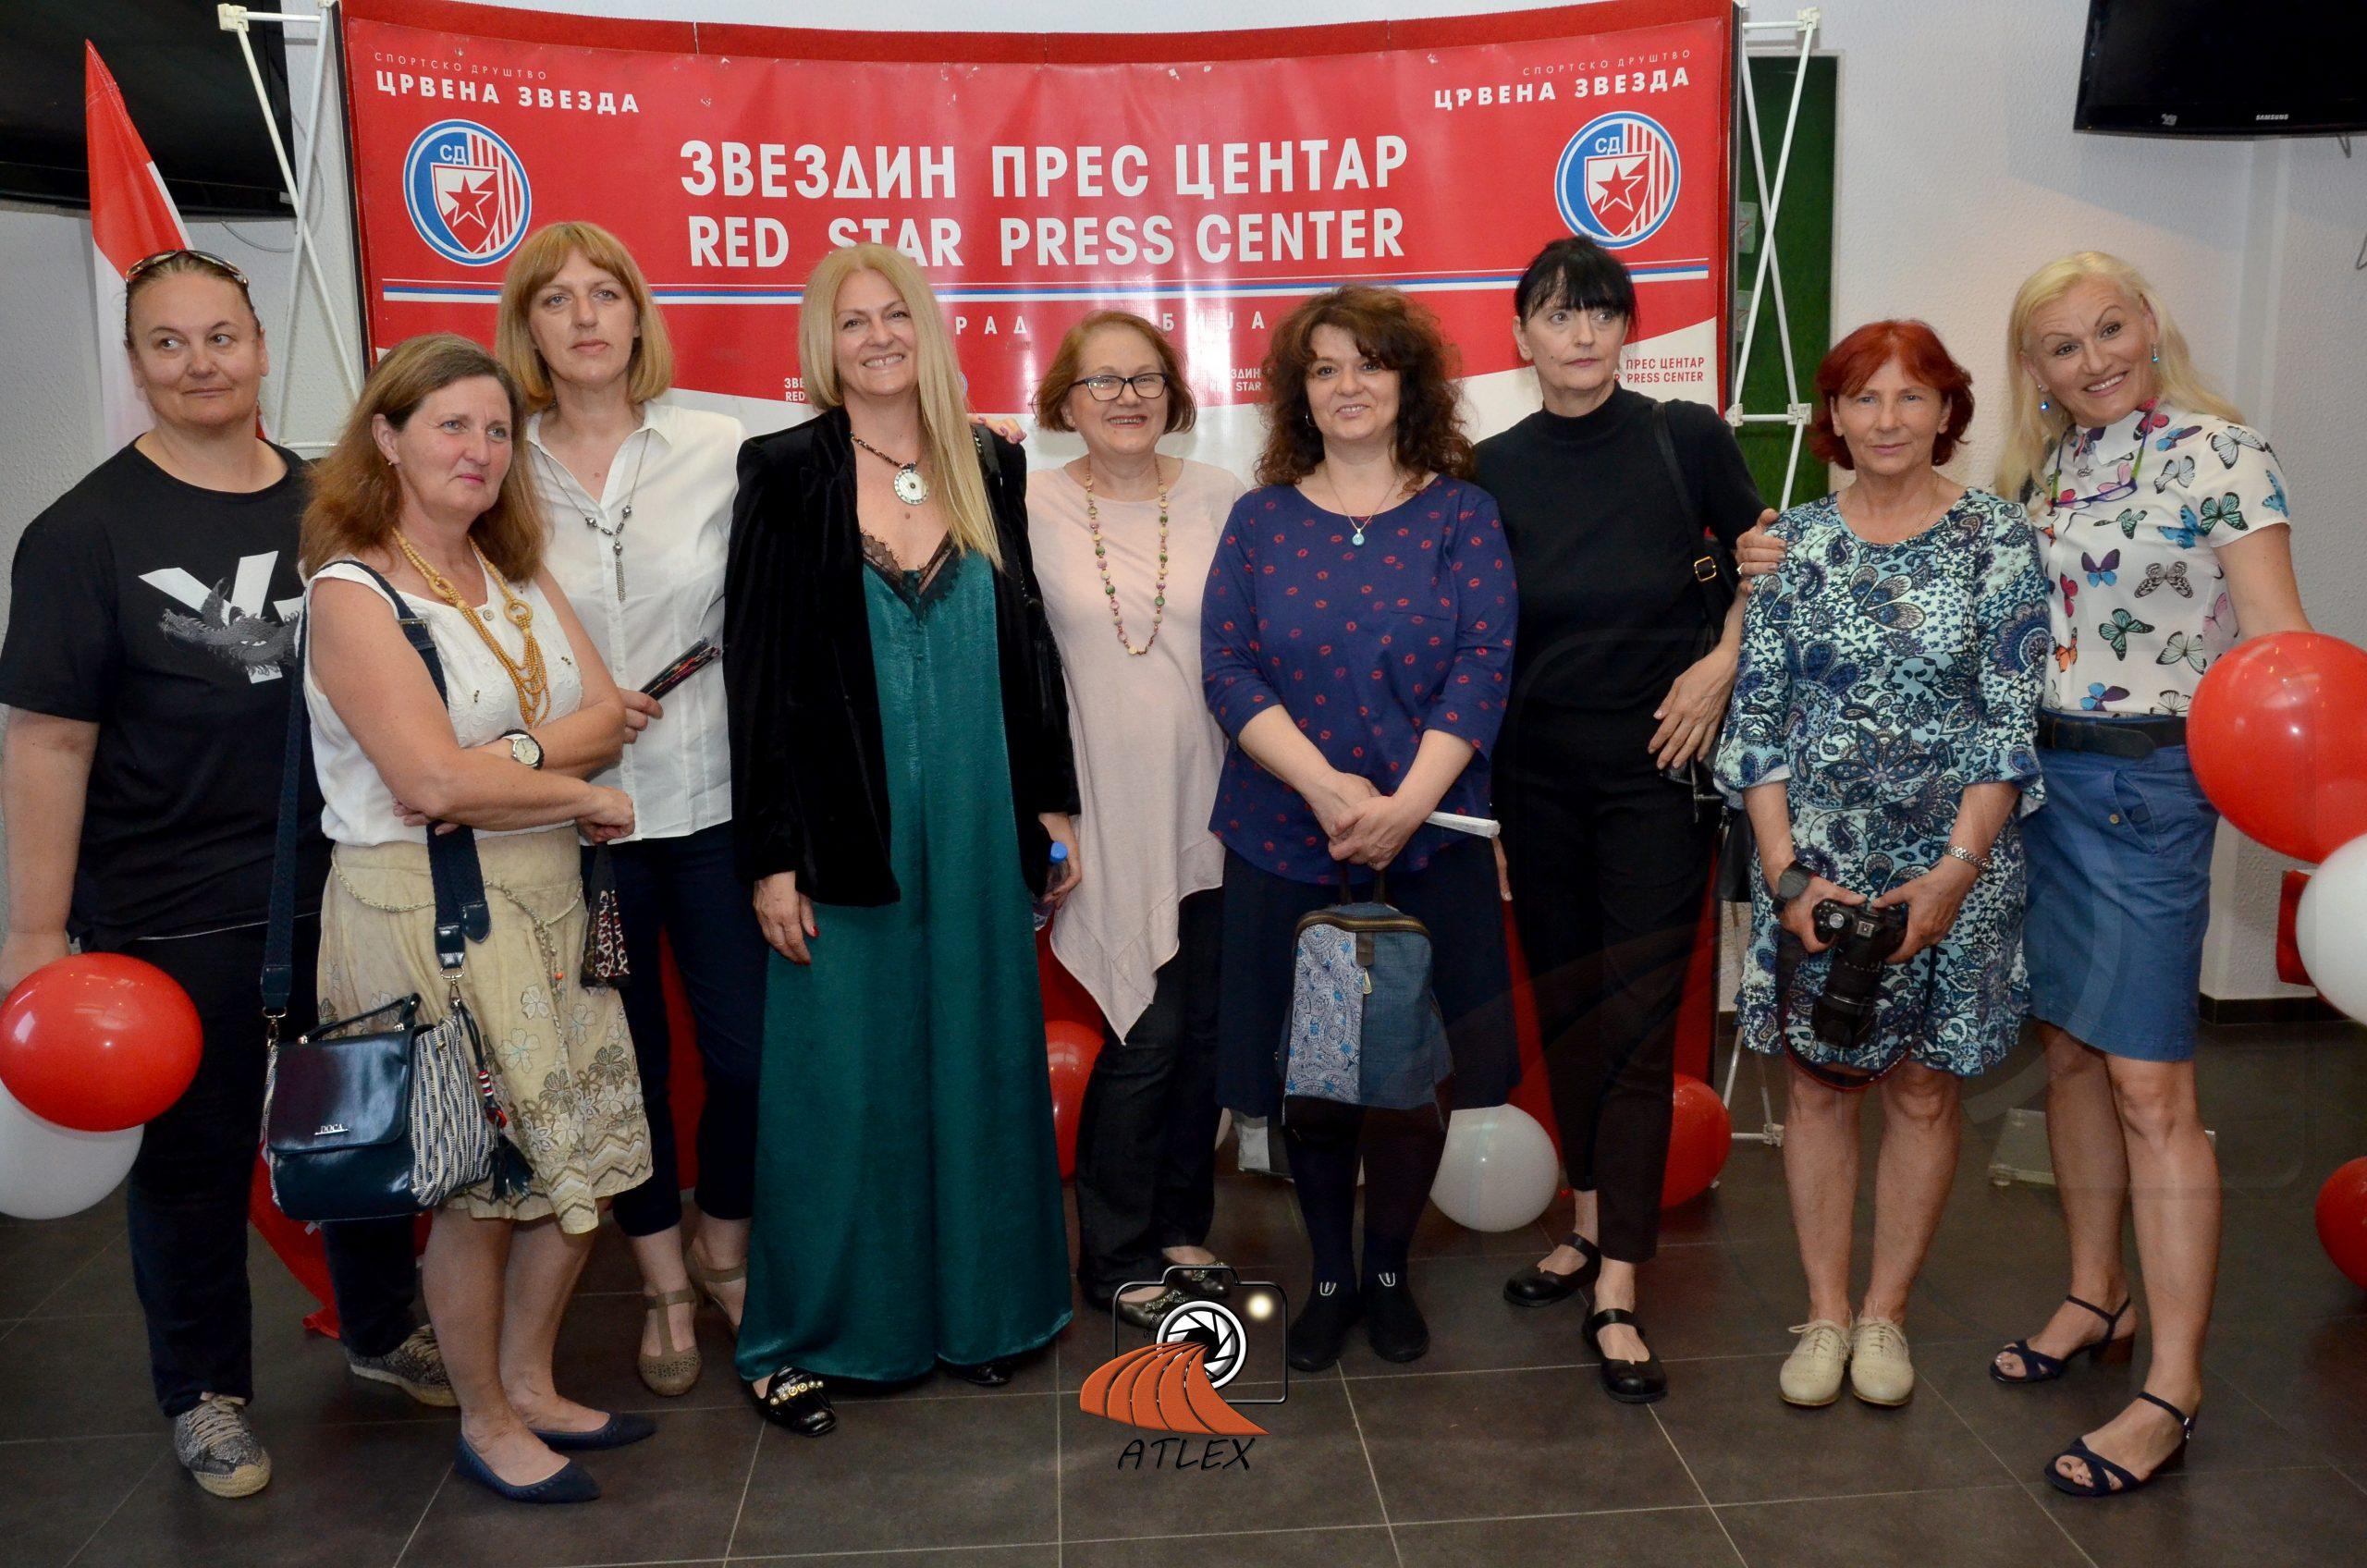 Ženska ekipa Crvene zvezde koja je 1989. postala vicešampion Evrope